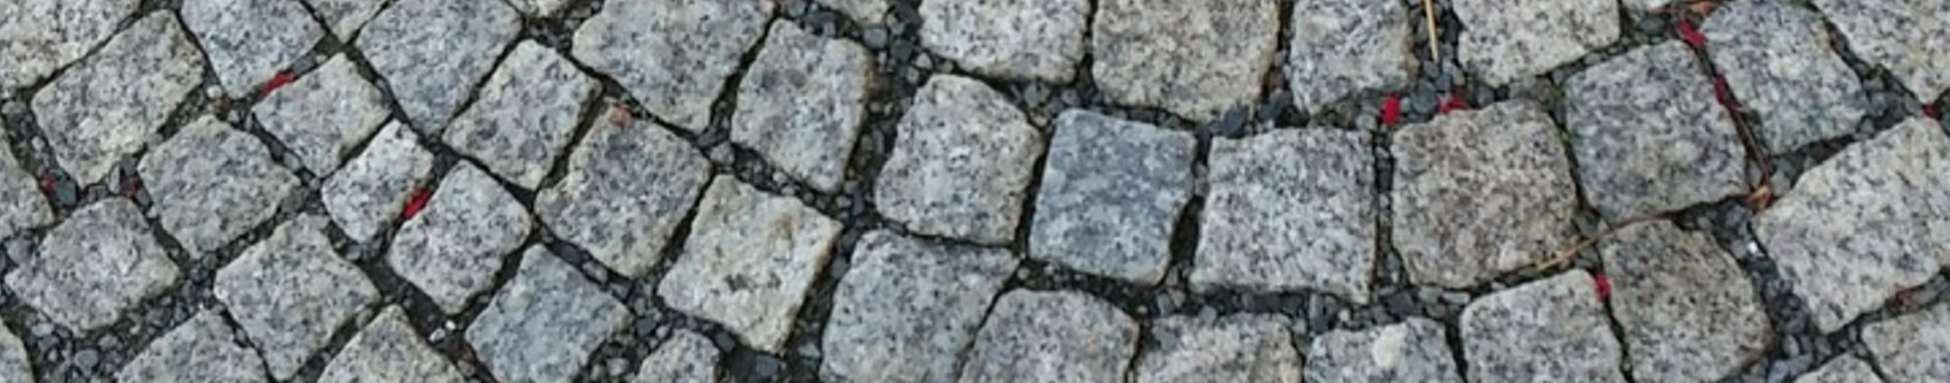 cobblestone_14573_mopik